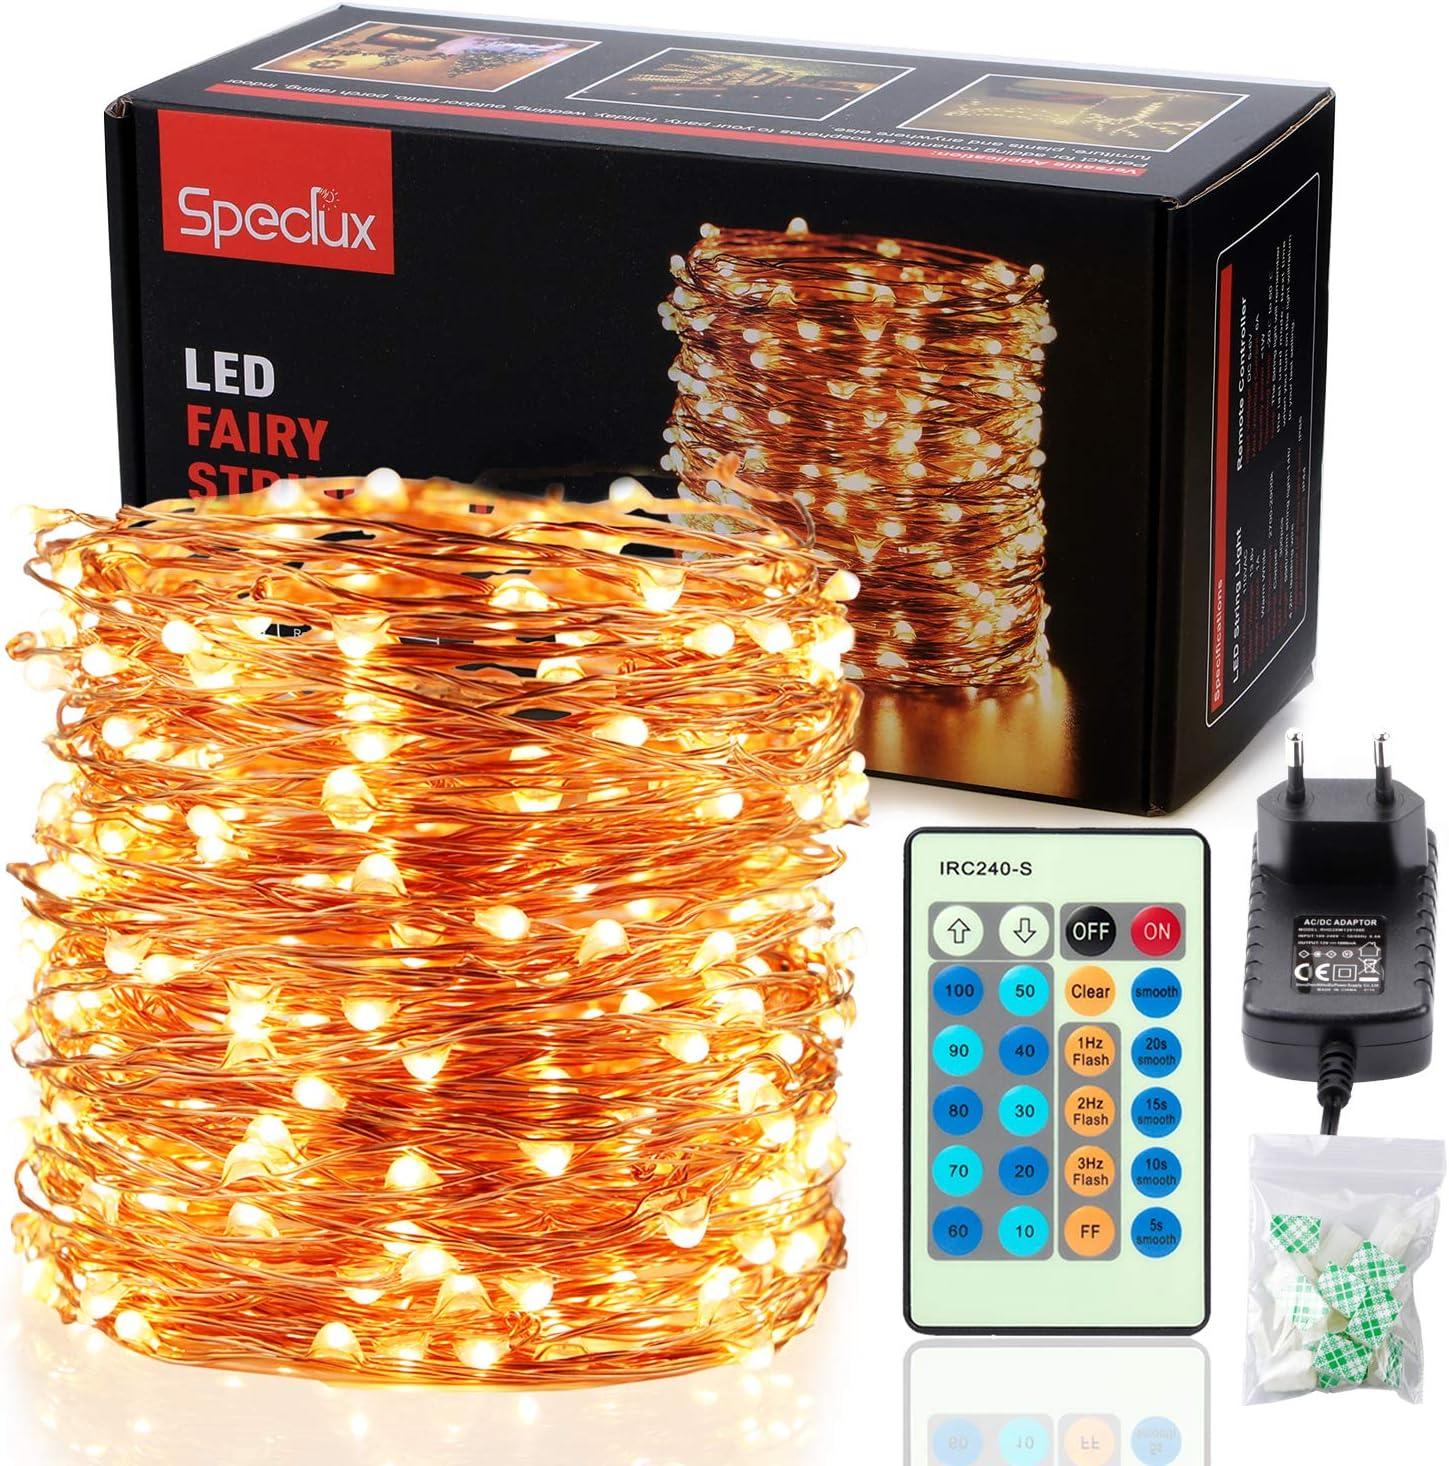 12V LED Lichterkette Draht Kupferkabel Lichtschnur Fenster Beleuchtung Party